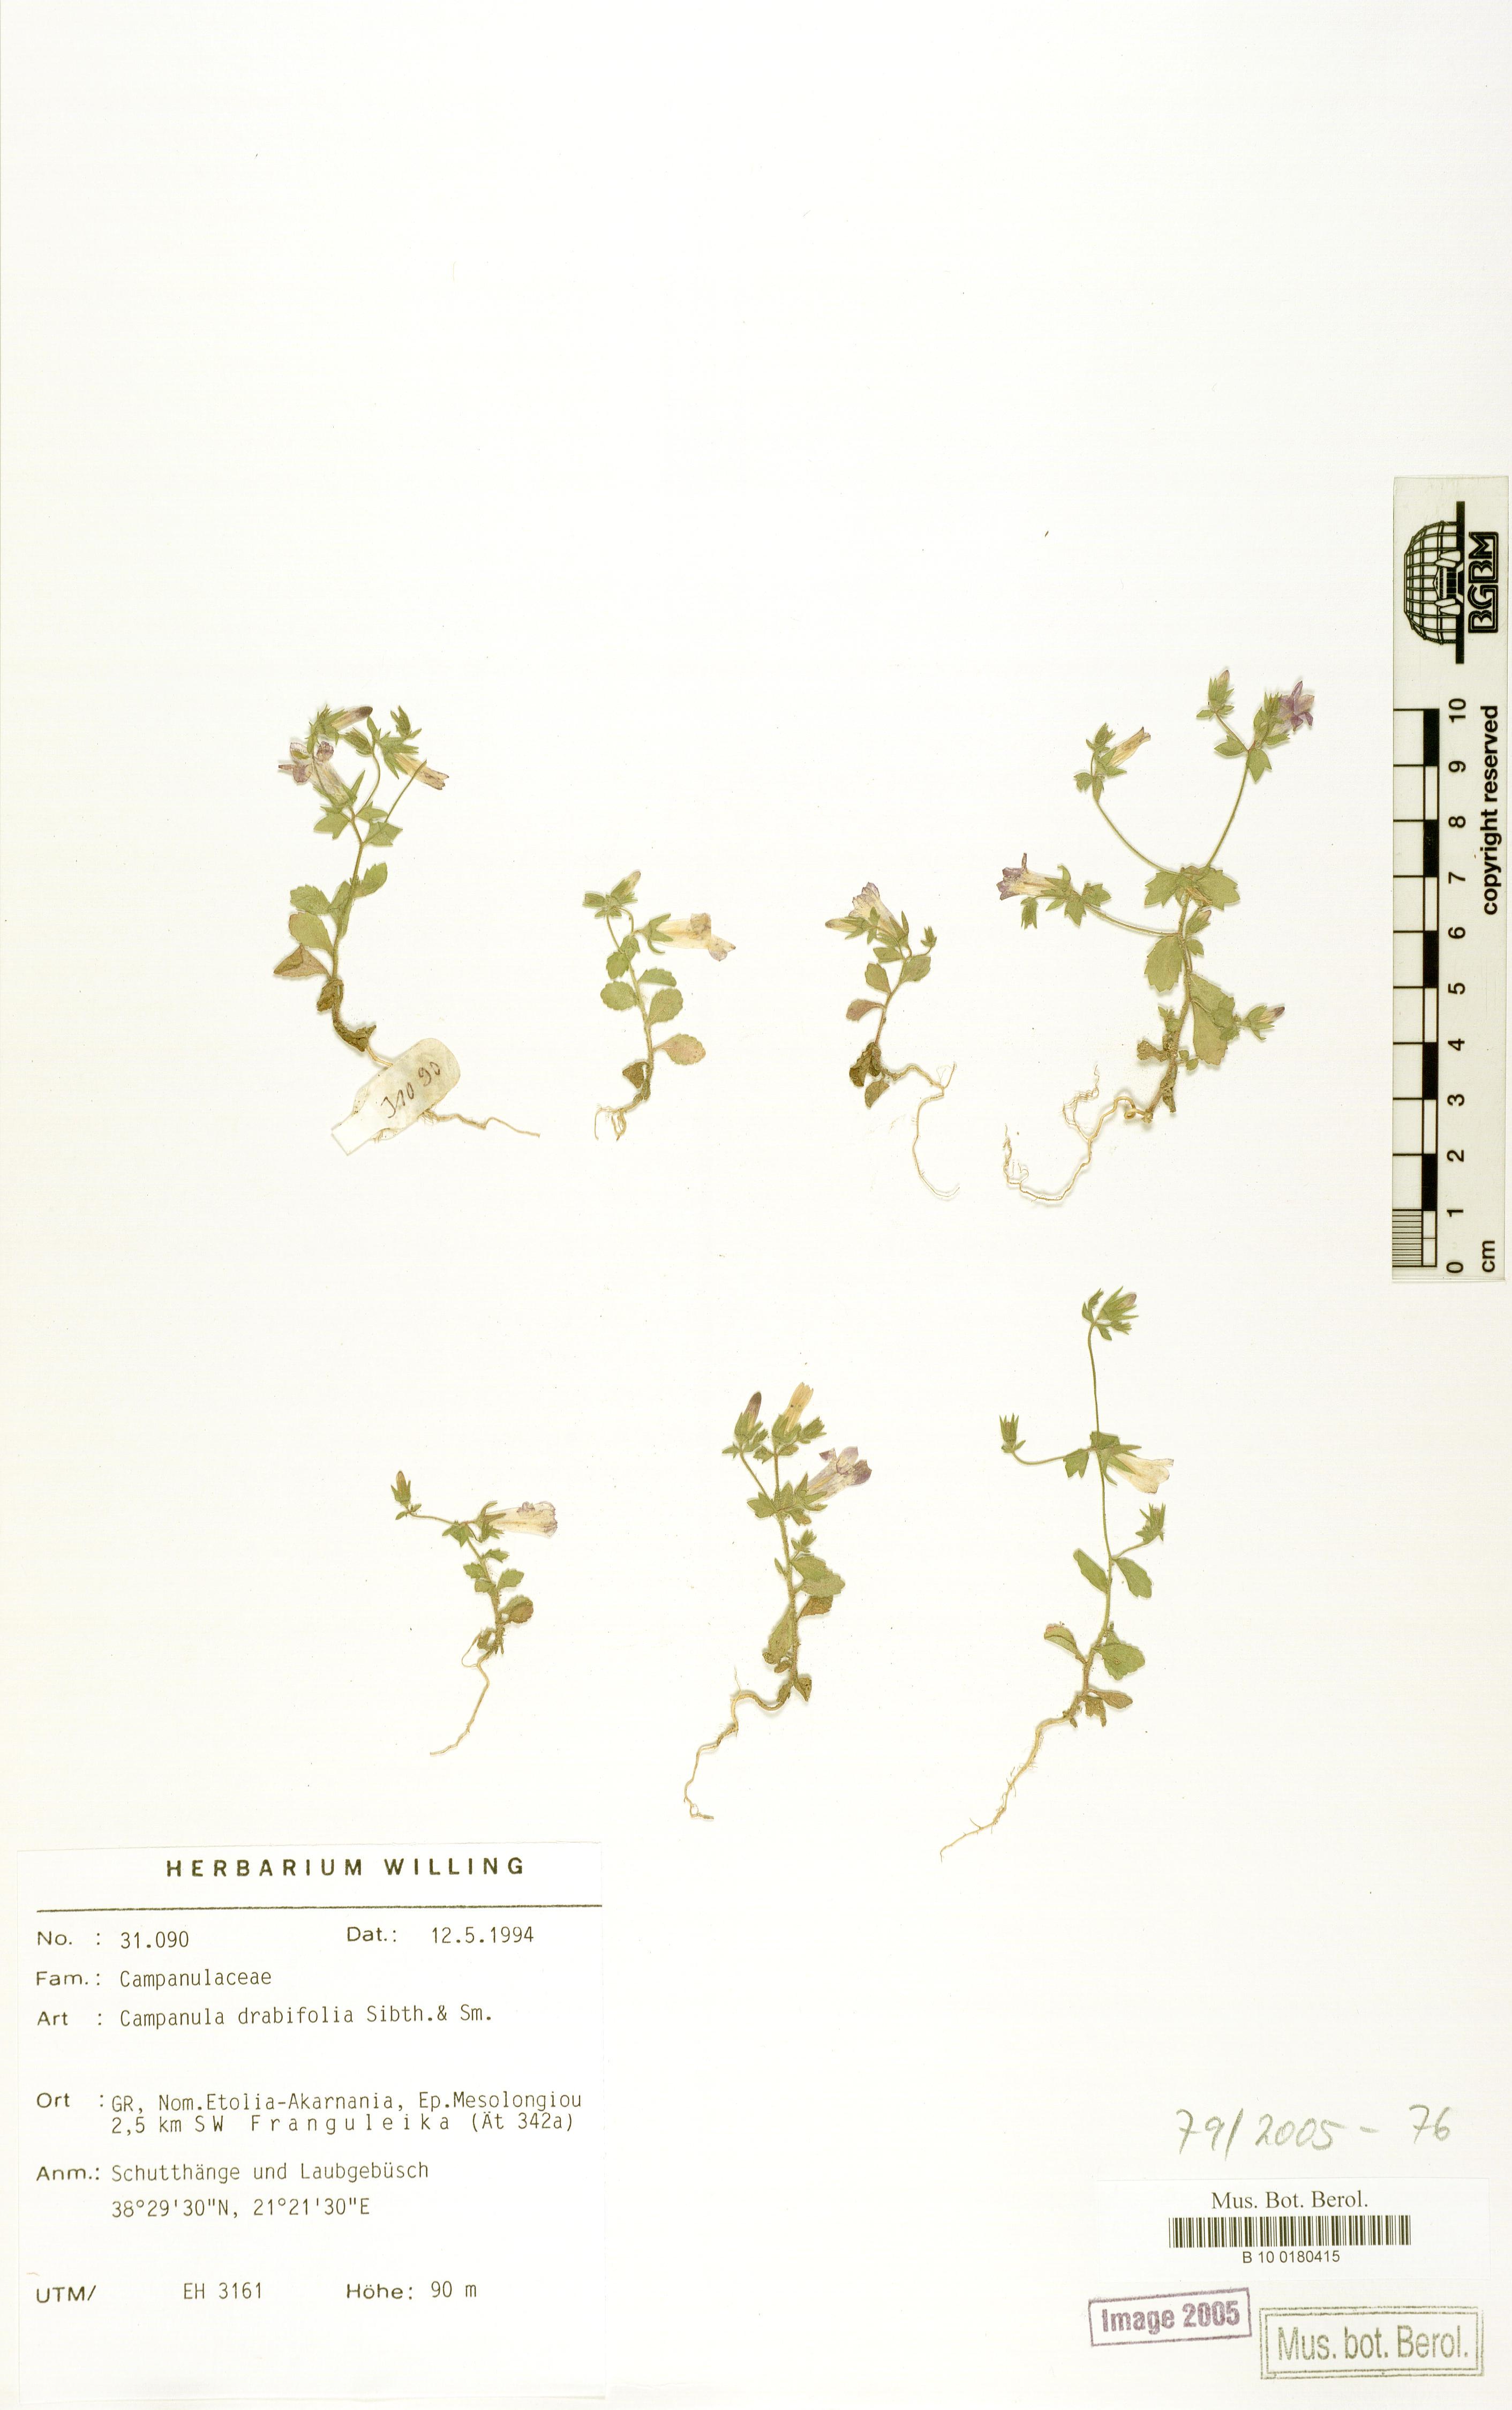 http://ww2.bgbm.org/herbarium/images/B/10/01/80/41/B_10_0180415.jpg